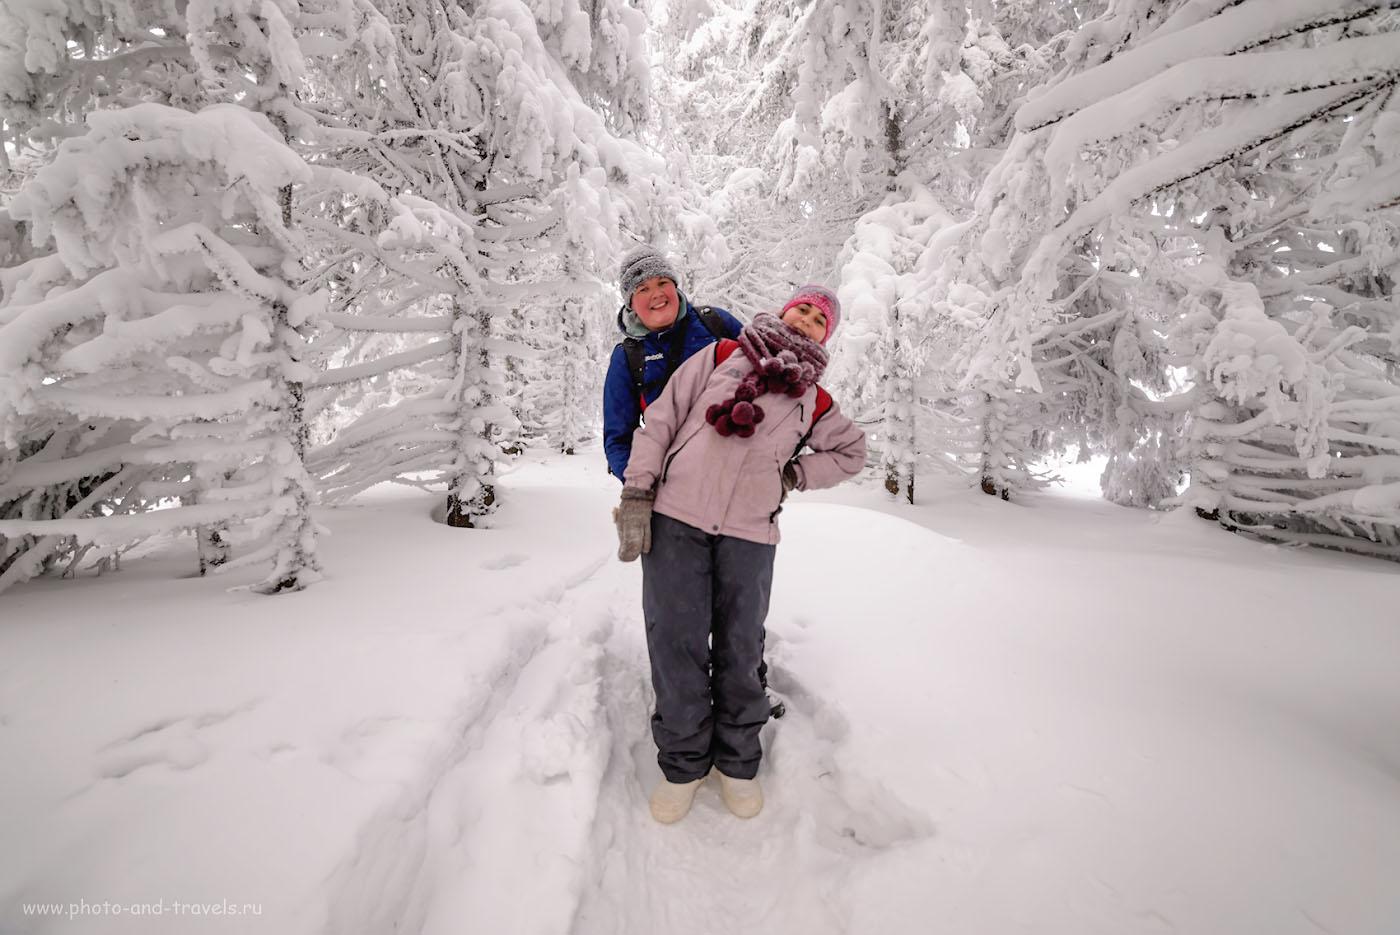 Фото 12. Привет из зимней сказки. Как мы поднимались на хребет Зюраткуль. Фотоаппарат Никон Д610, объектив Самъянг 14мм f/2.8. Параметры съемки: 1/160, +0.67, 2.8, 250, 14.